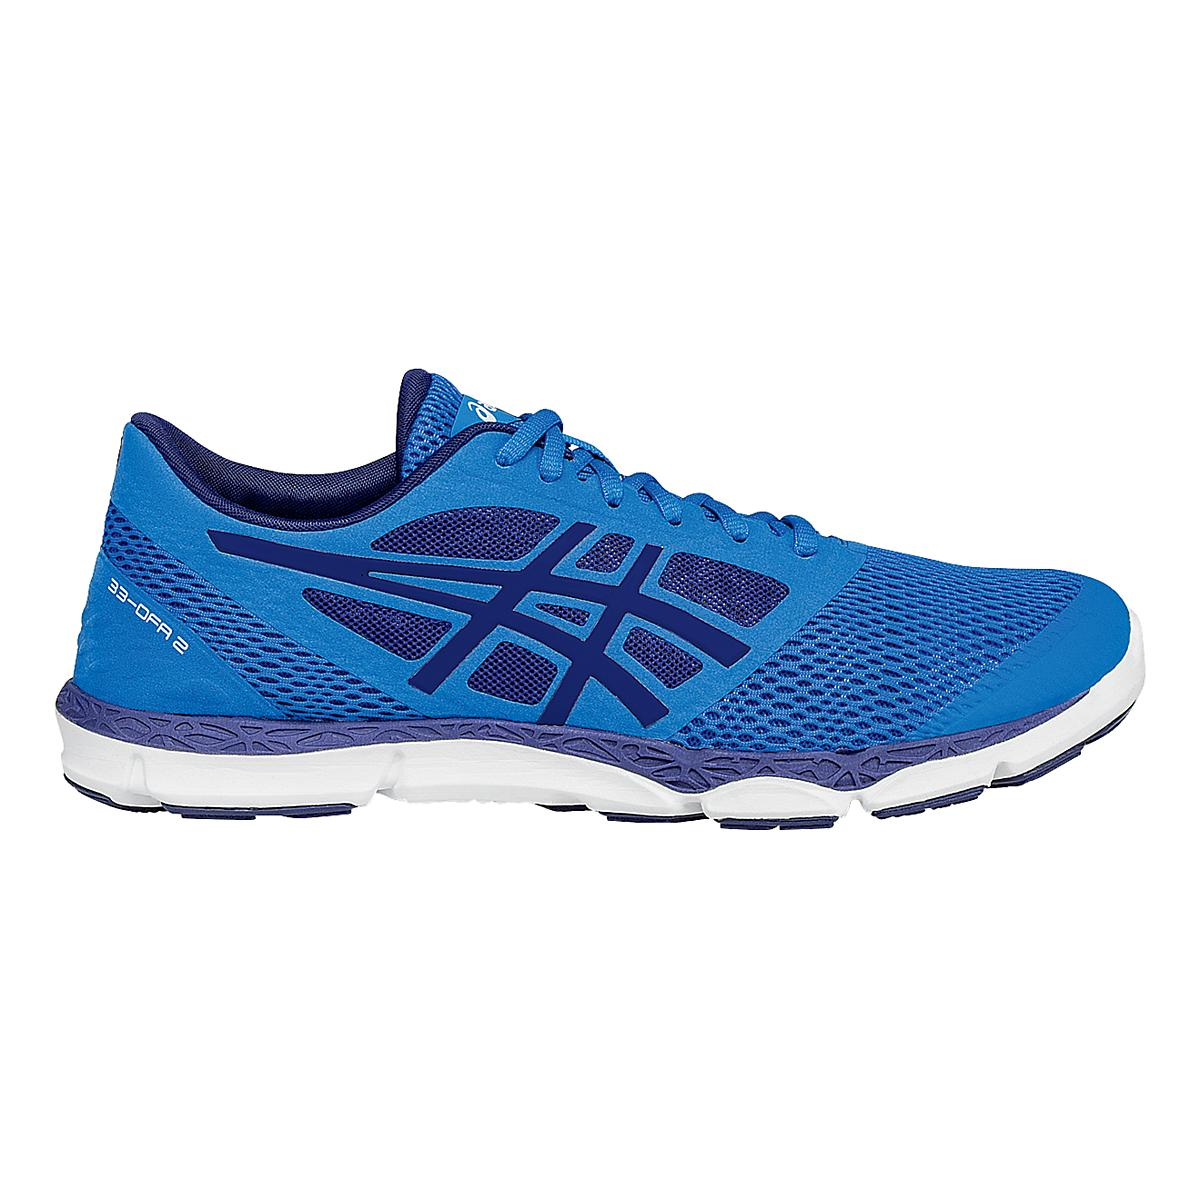 03249c2217903 Mens ASICS 33-DFA 2 Running Shoe at Road Runner Sports